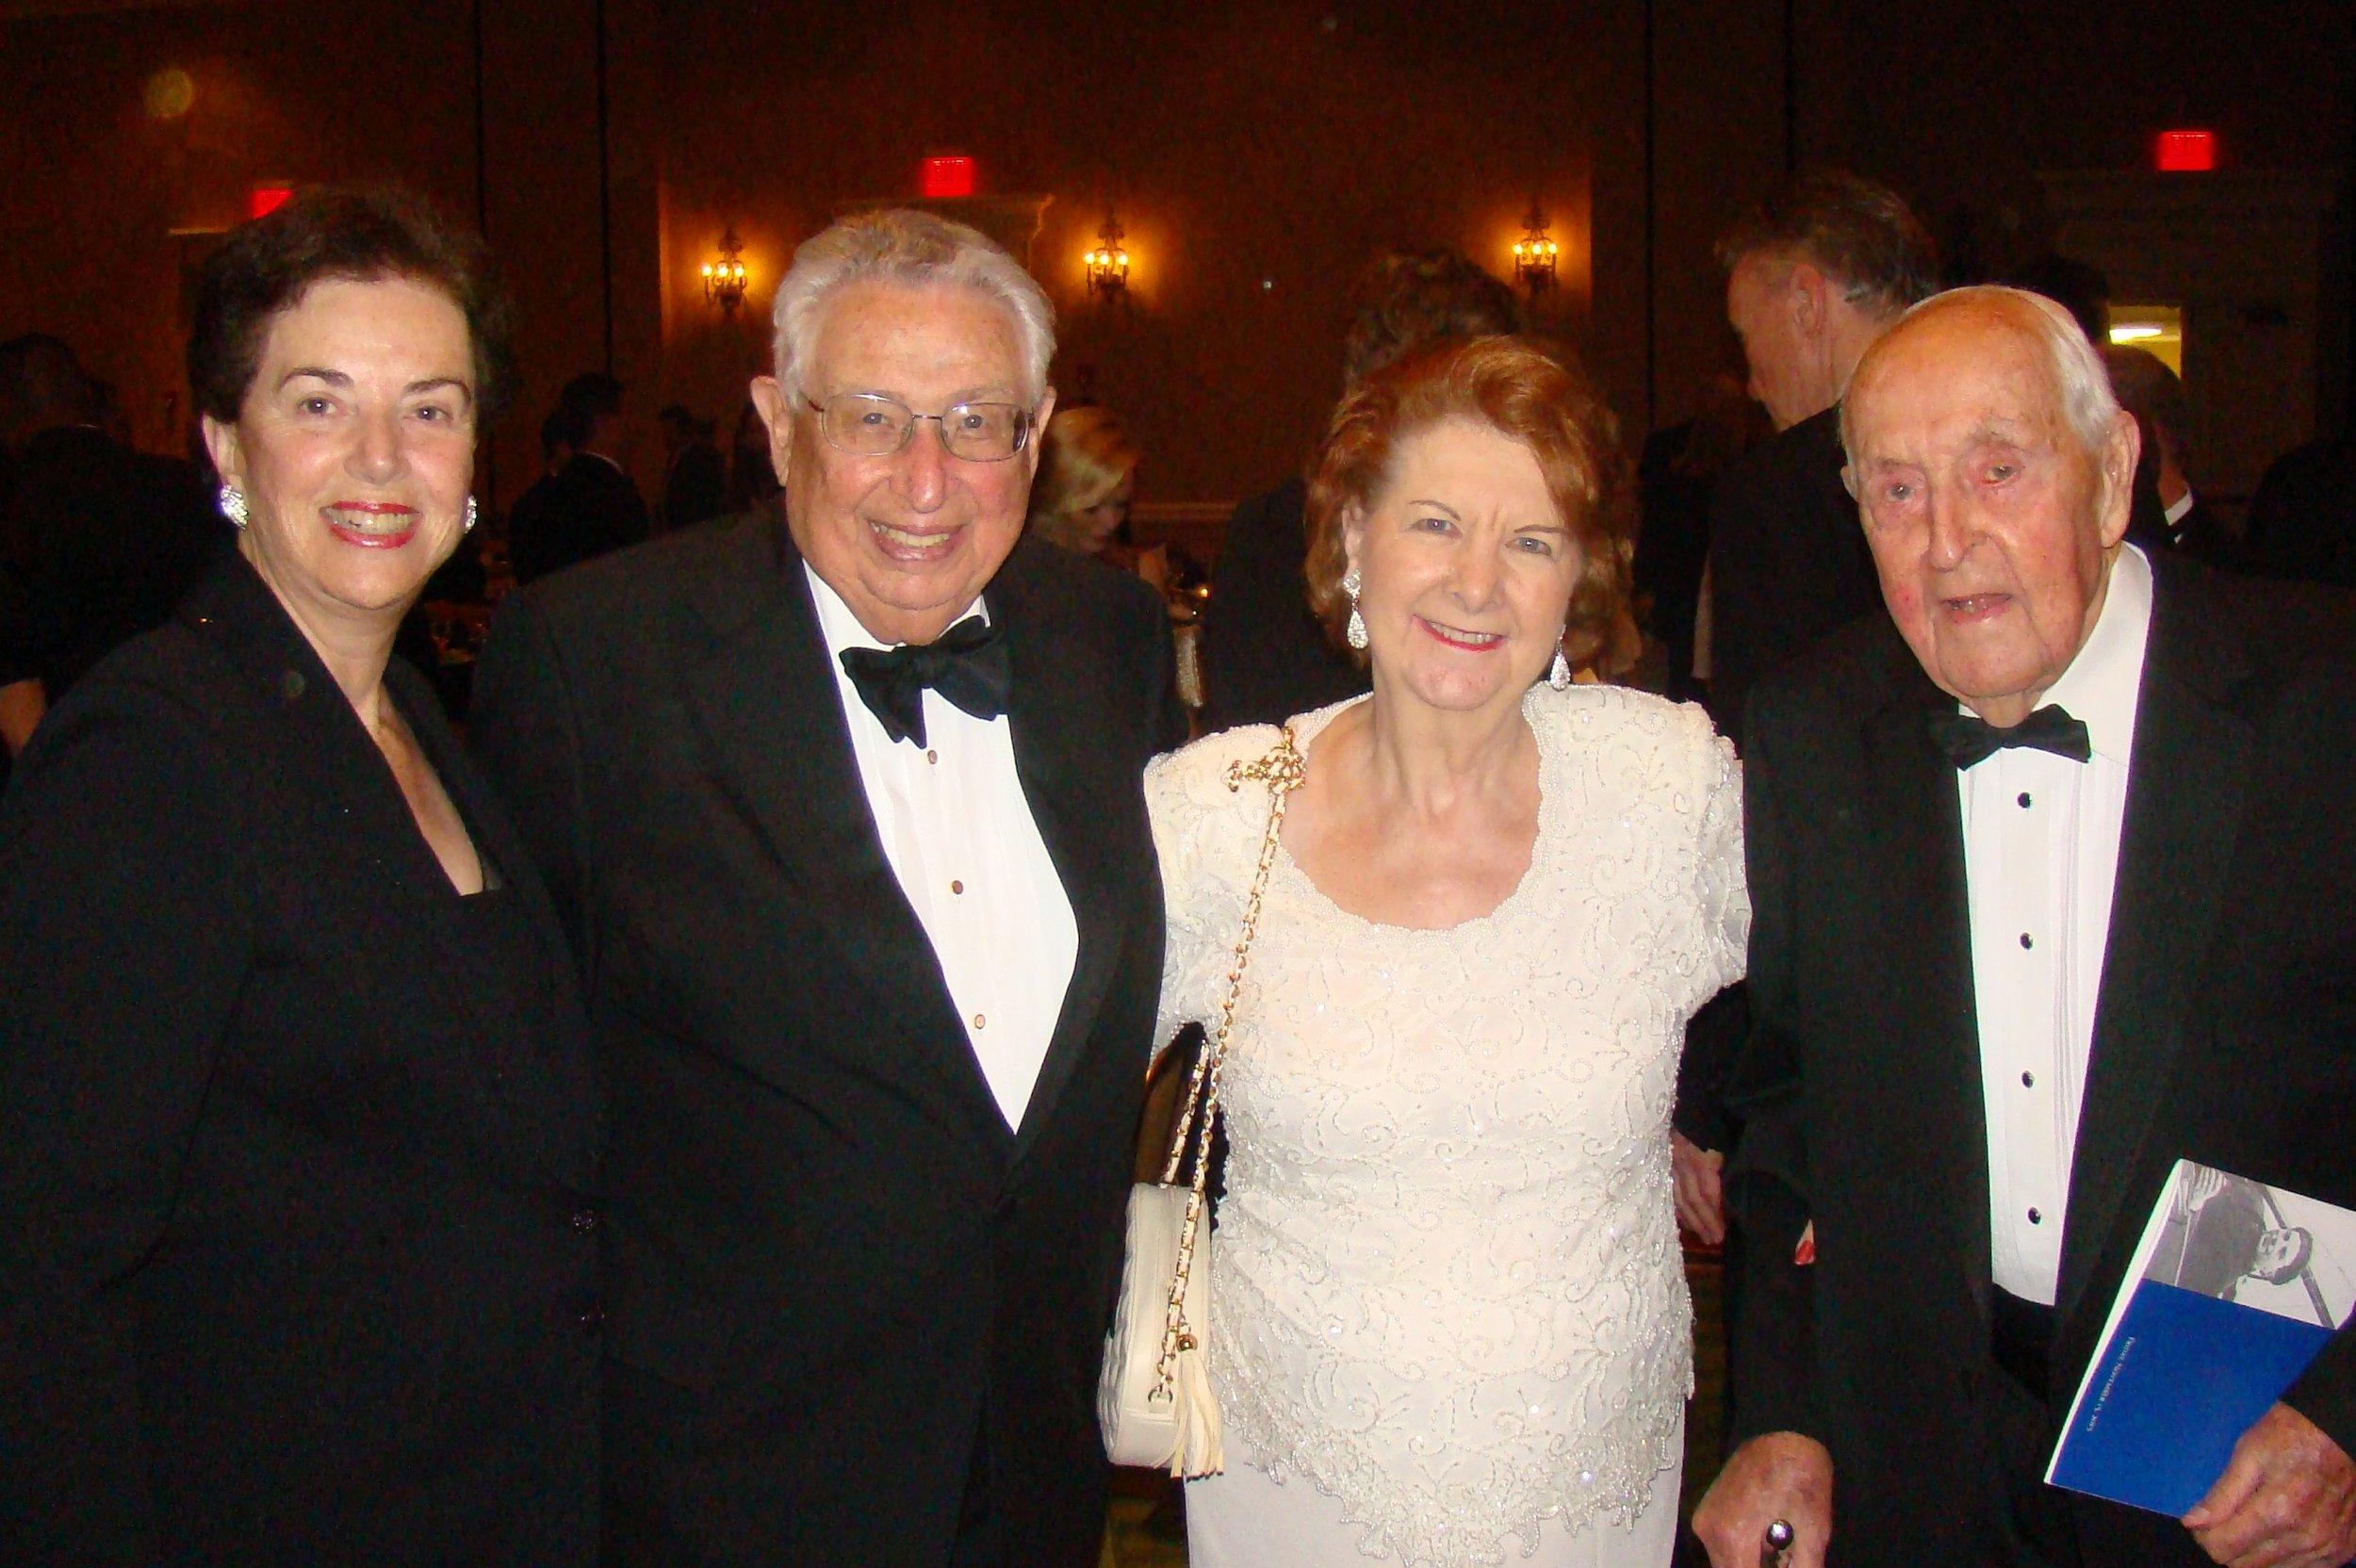 Nancy & Edwin Colodny, Dorothy Derrick and Sir Lenox Hewitt, 15 Nov '13 - Copy.JPG